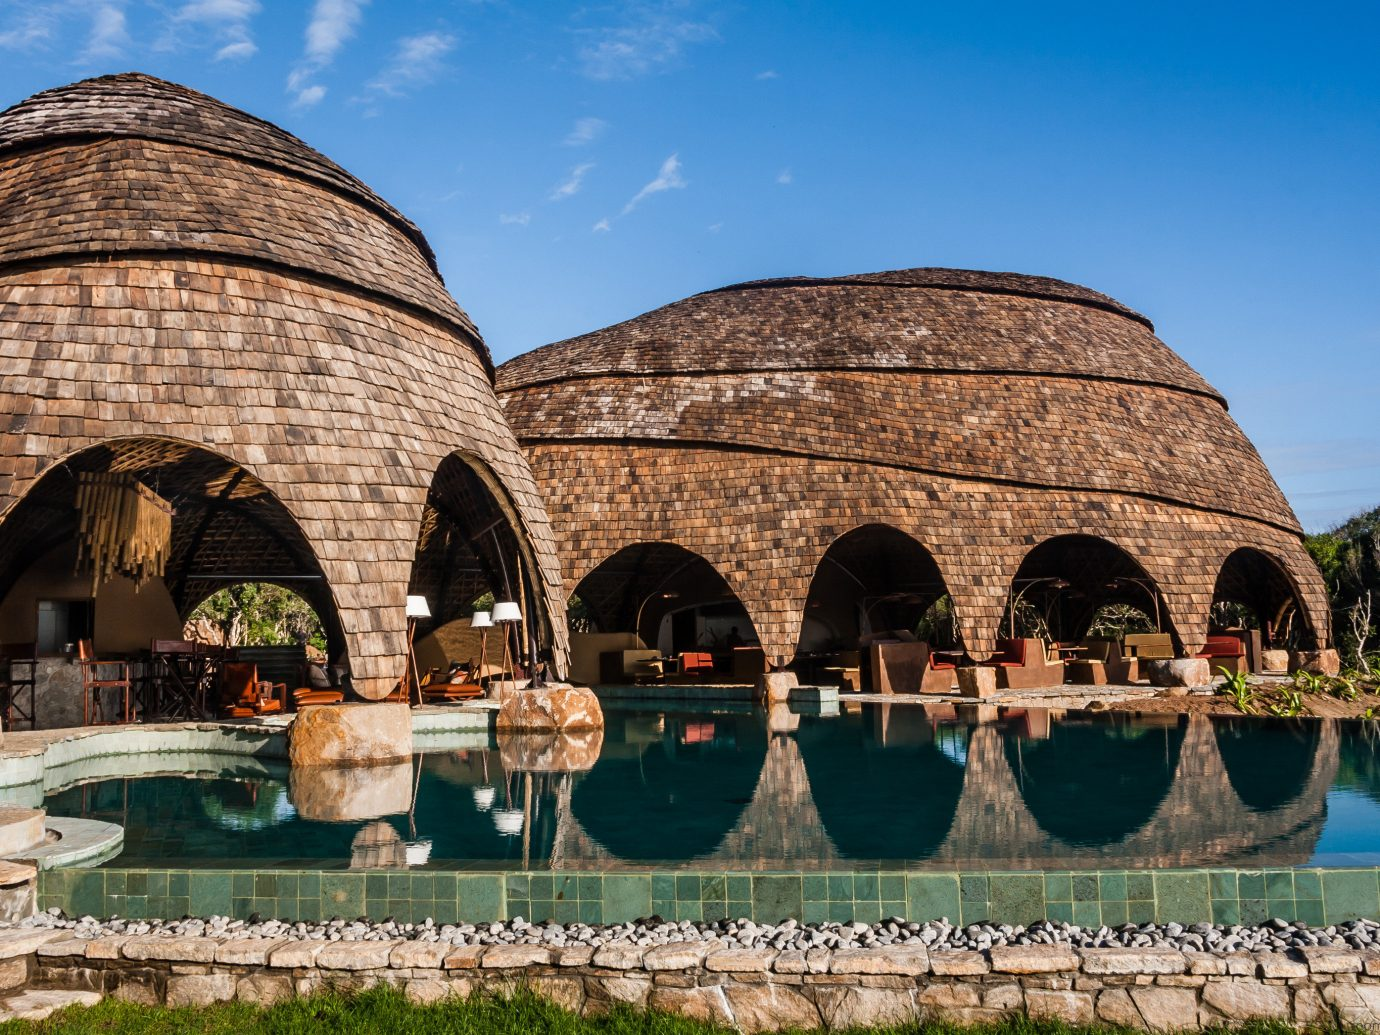 Hotels Outdoors + Adventure historic site sky tourism leisure reflection tourist attraction caravanserai estate hacienda building water byzantine architecture ancient history